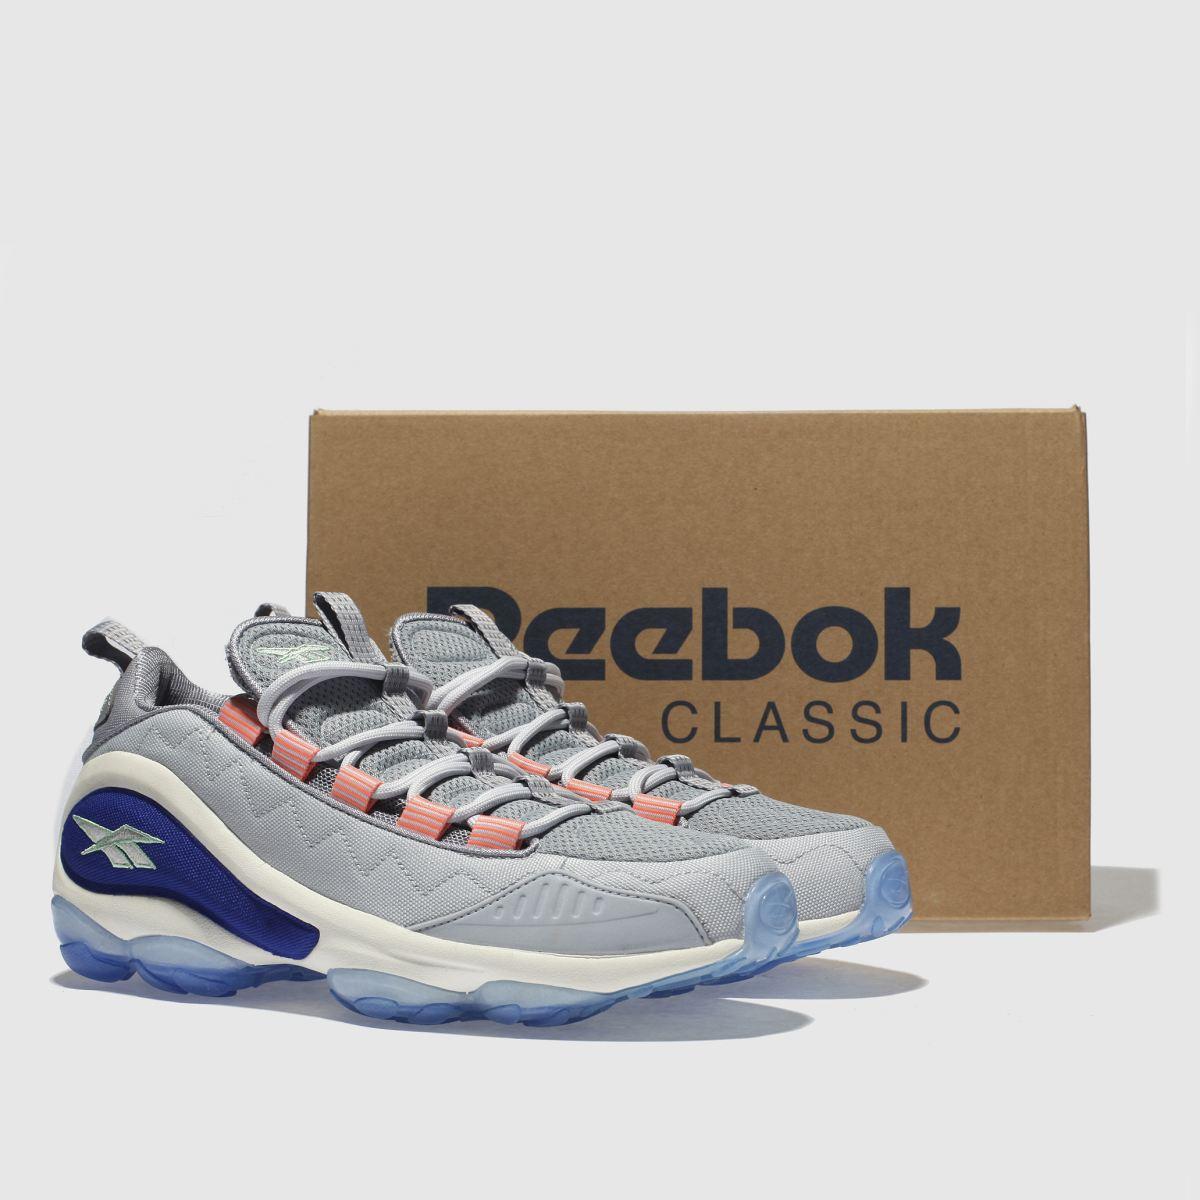 Damen Grau-blau reebok Dmx schuh Run 10 Sneaker | schuh Dmx Gute Qualität beliebte Schuhe 41468c